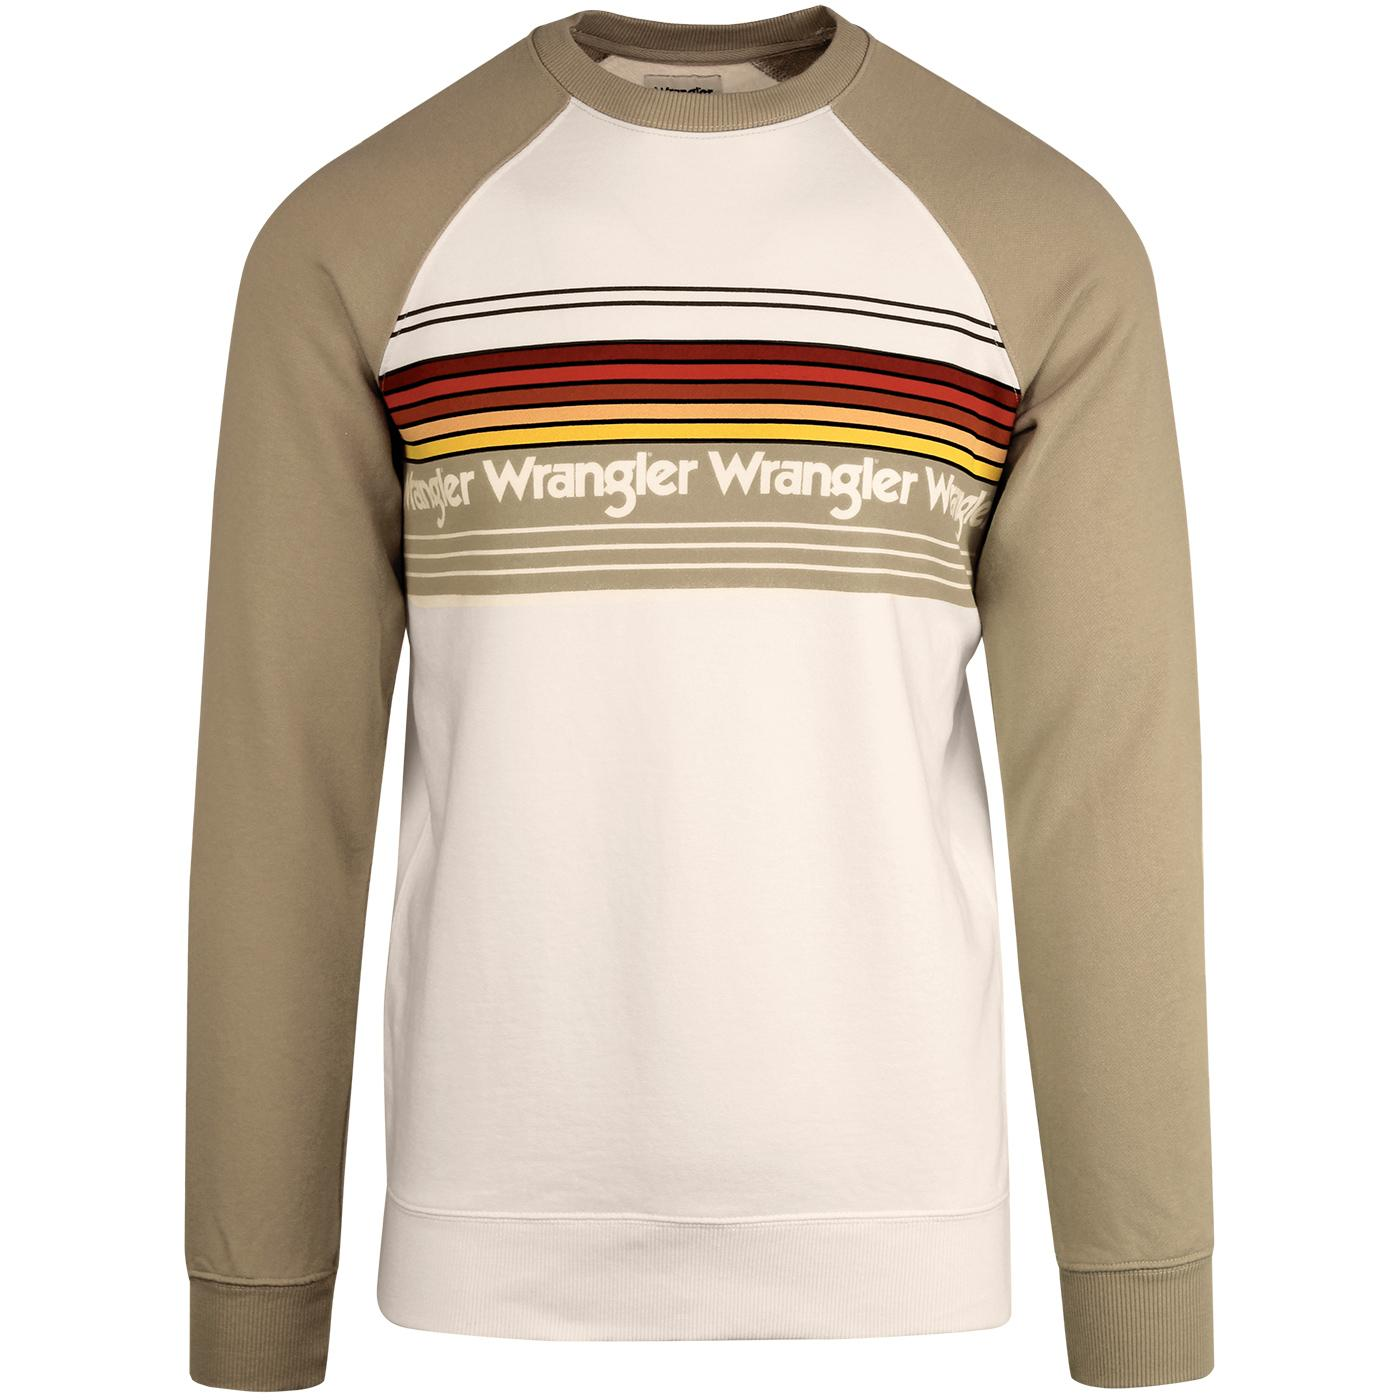 WRANGLER Retro 1970s Rainbow Stripe Sweatshirt